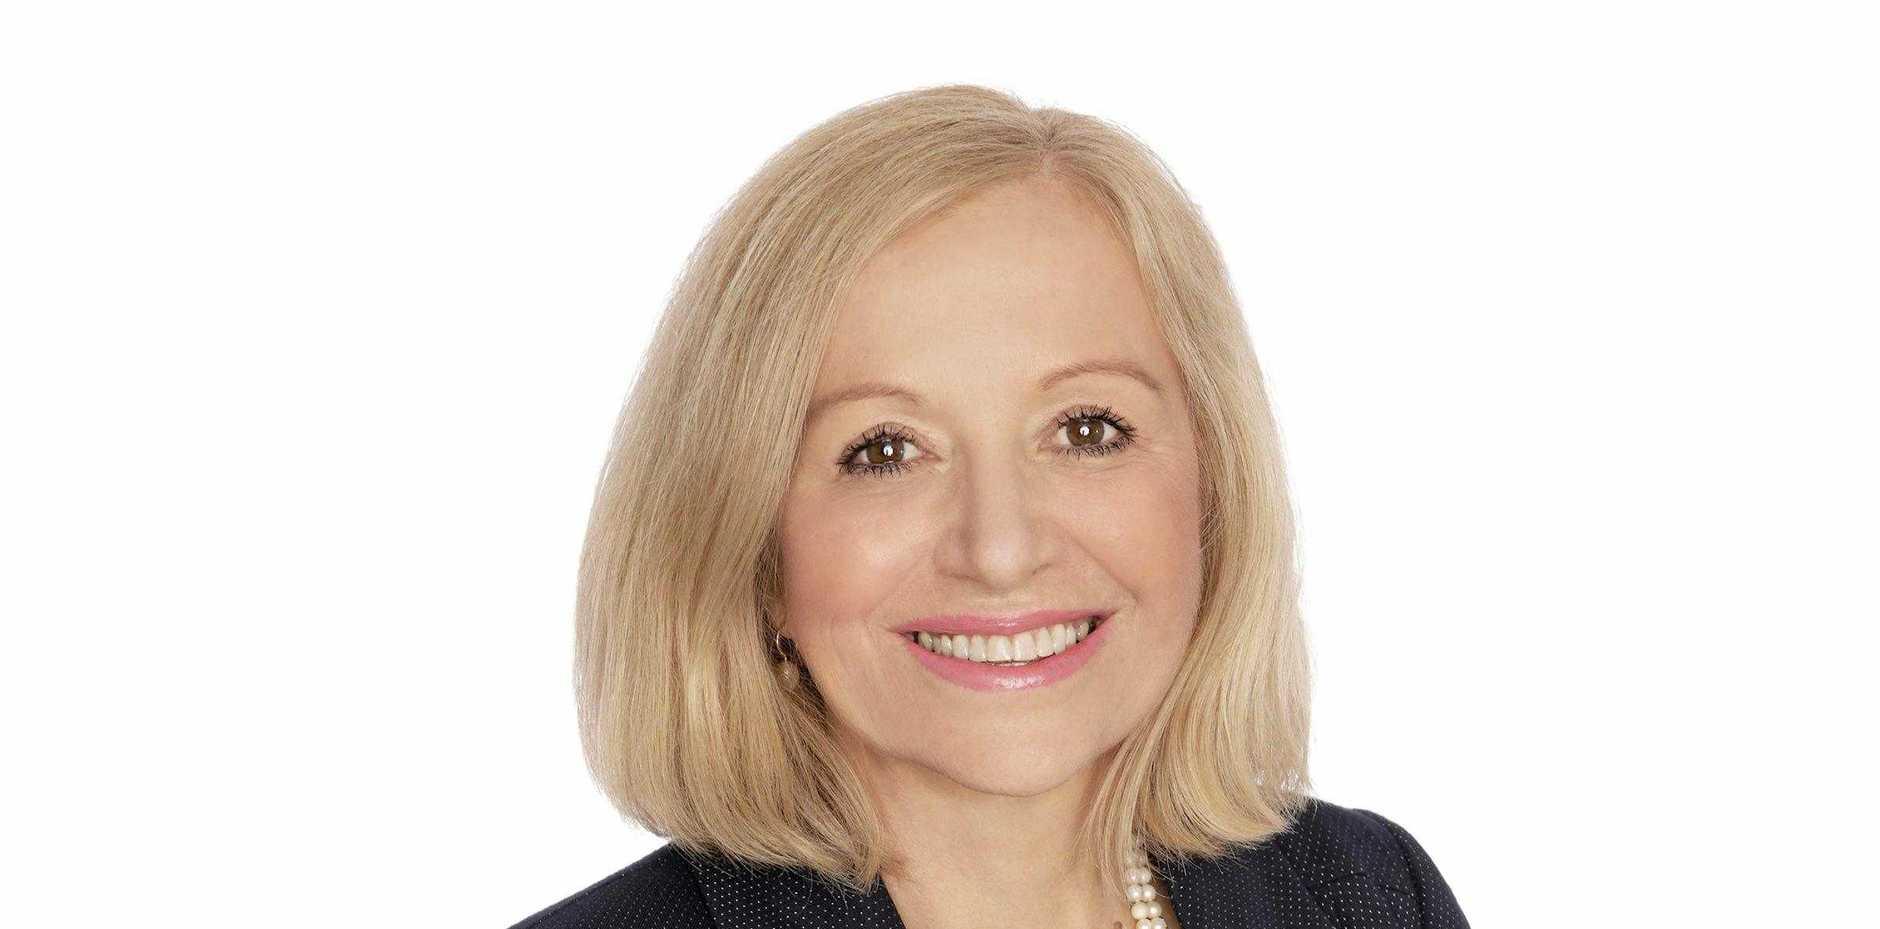 OnTalent General Manager - Careers, Leadership Development & Consulting, Deborah Wilson.